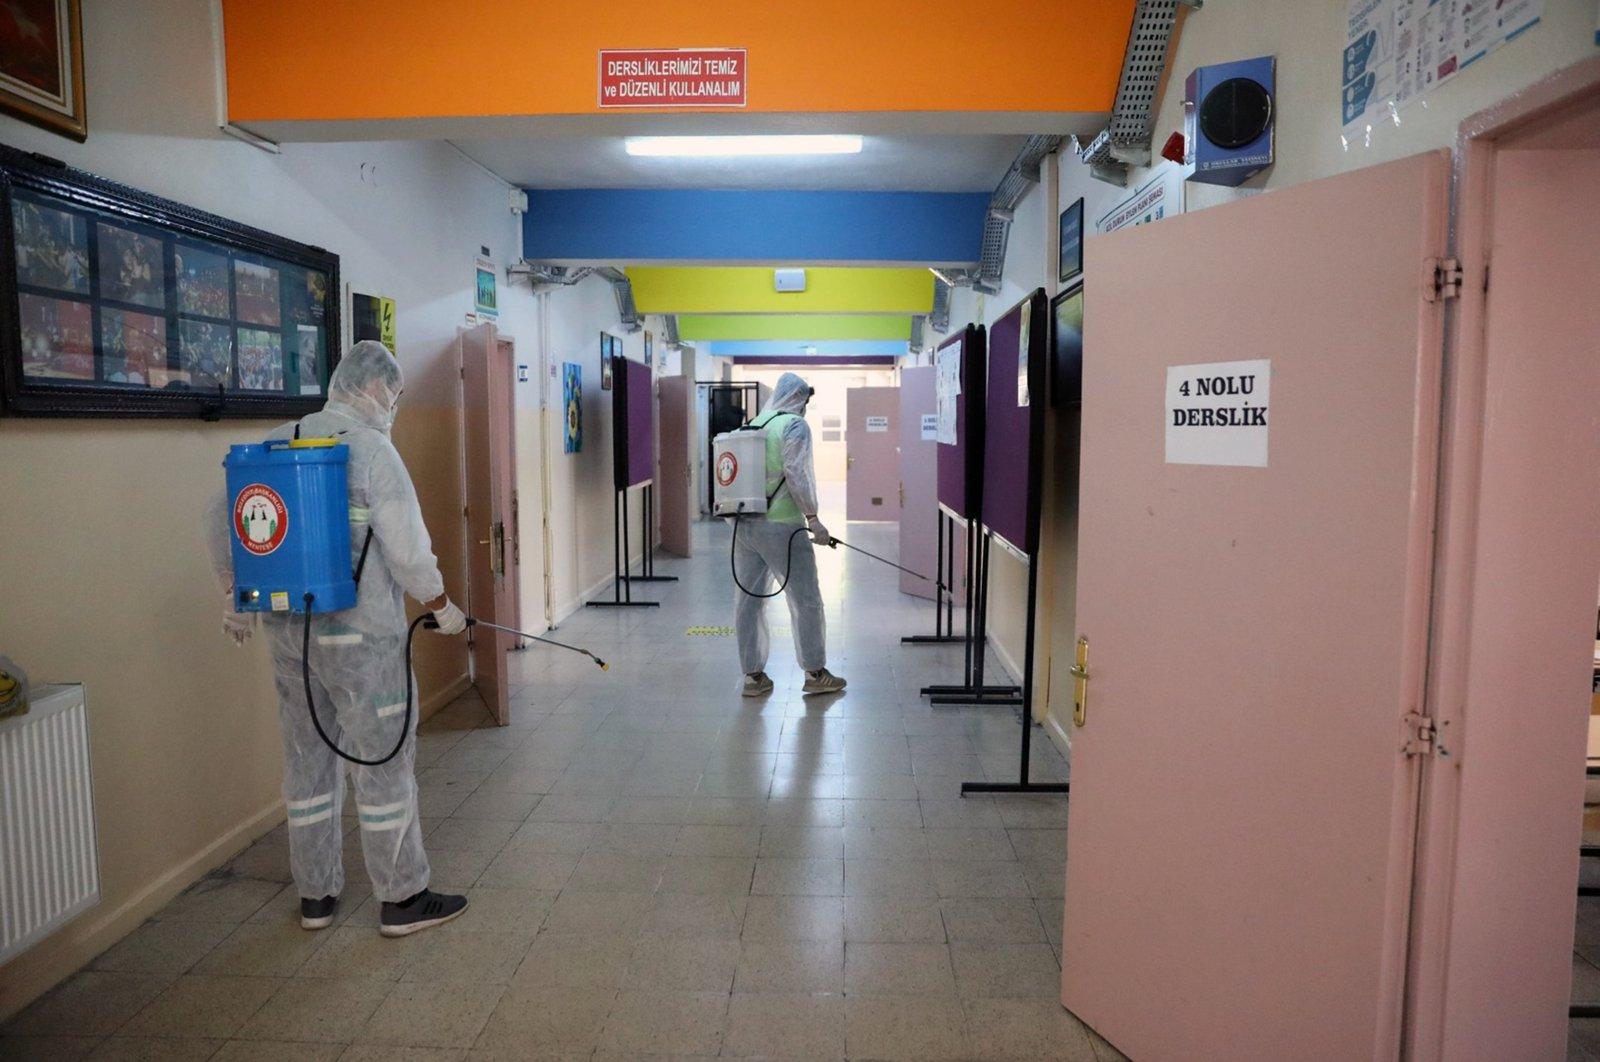 Municipal workers disinfect school before nationwide high school entrance exam in Menteşe district, Muğla, Turkey, June 6, 2021. (IHA Photo)